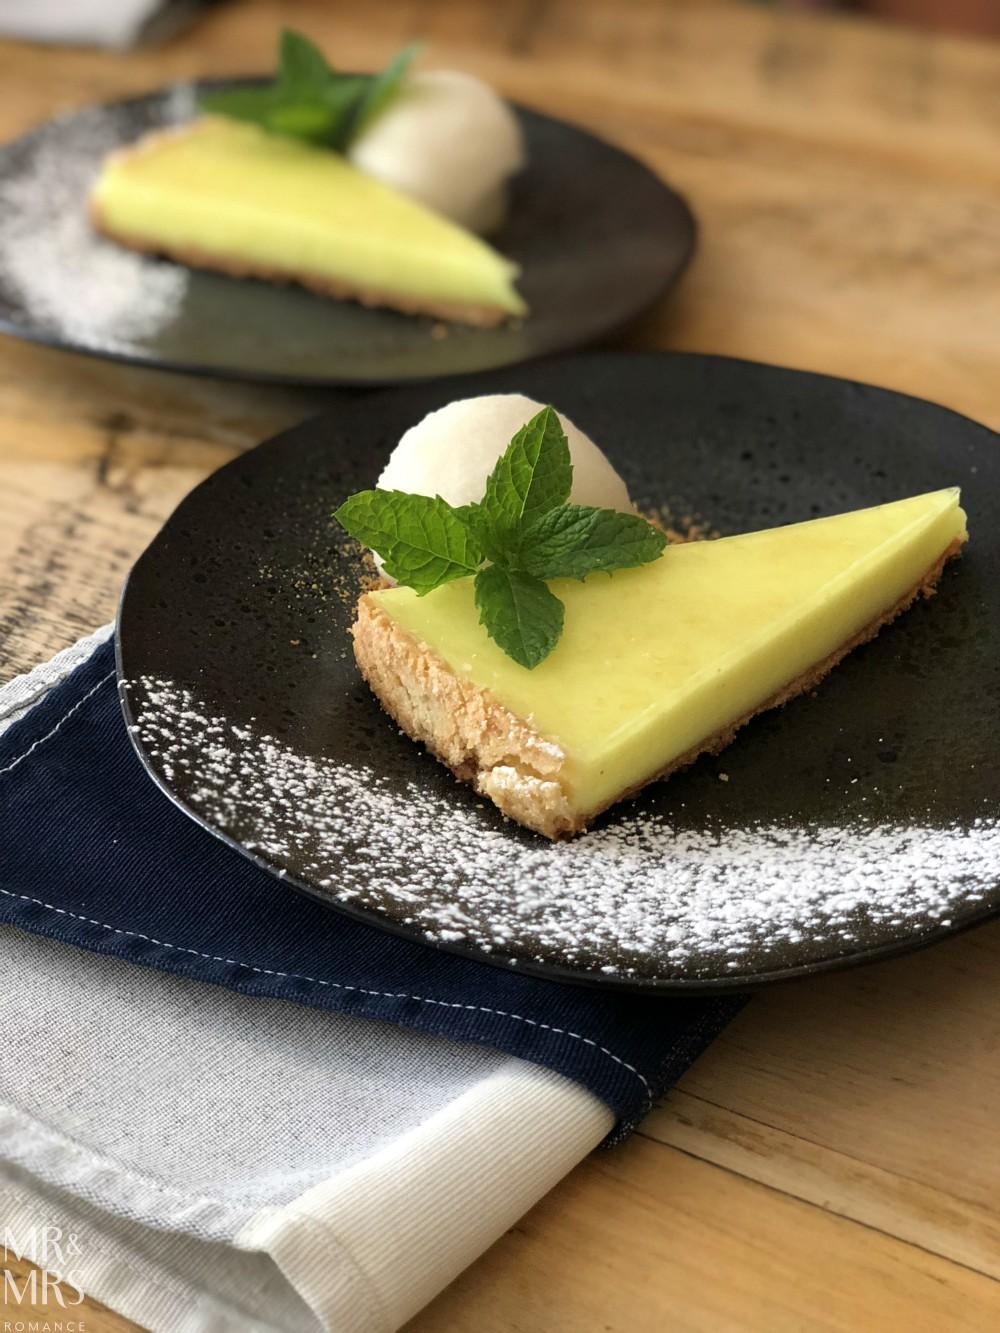 English countryside food - Cradle Sudbury tart